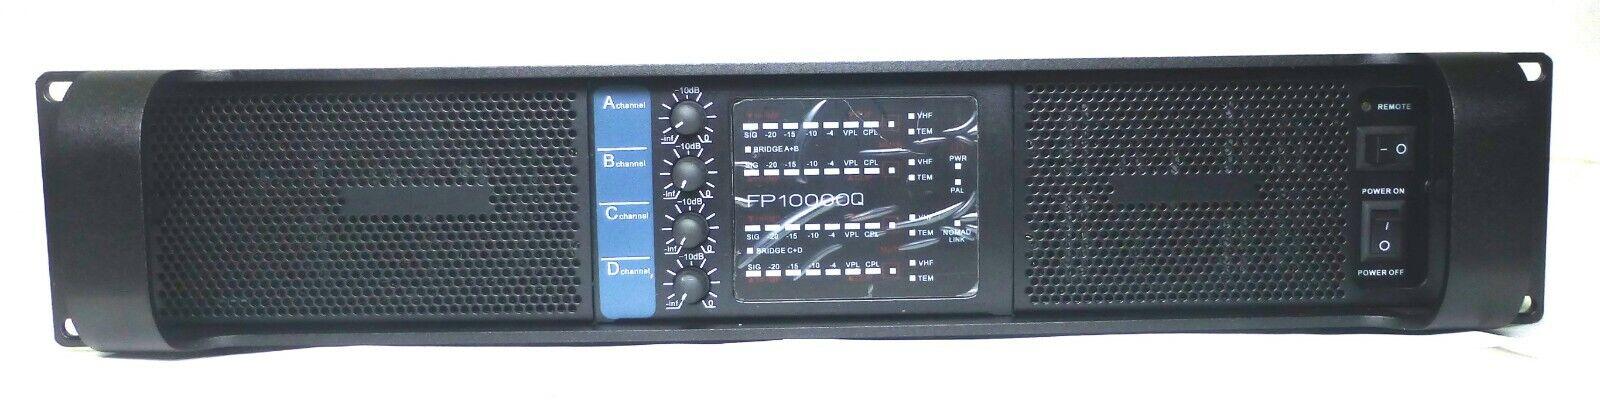 New FP 10000 Series Professional Power Amplifier 4 Channel Amplifier